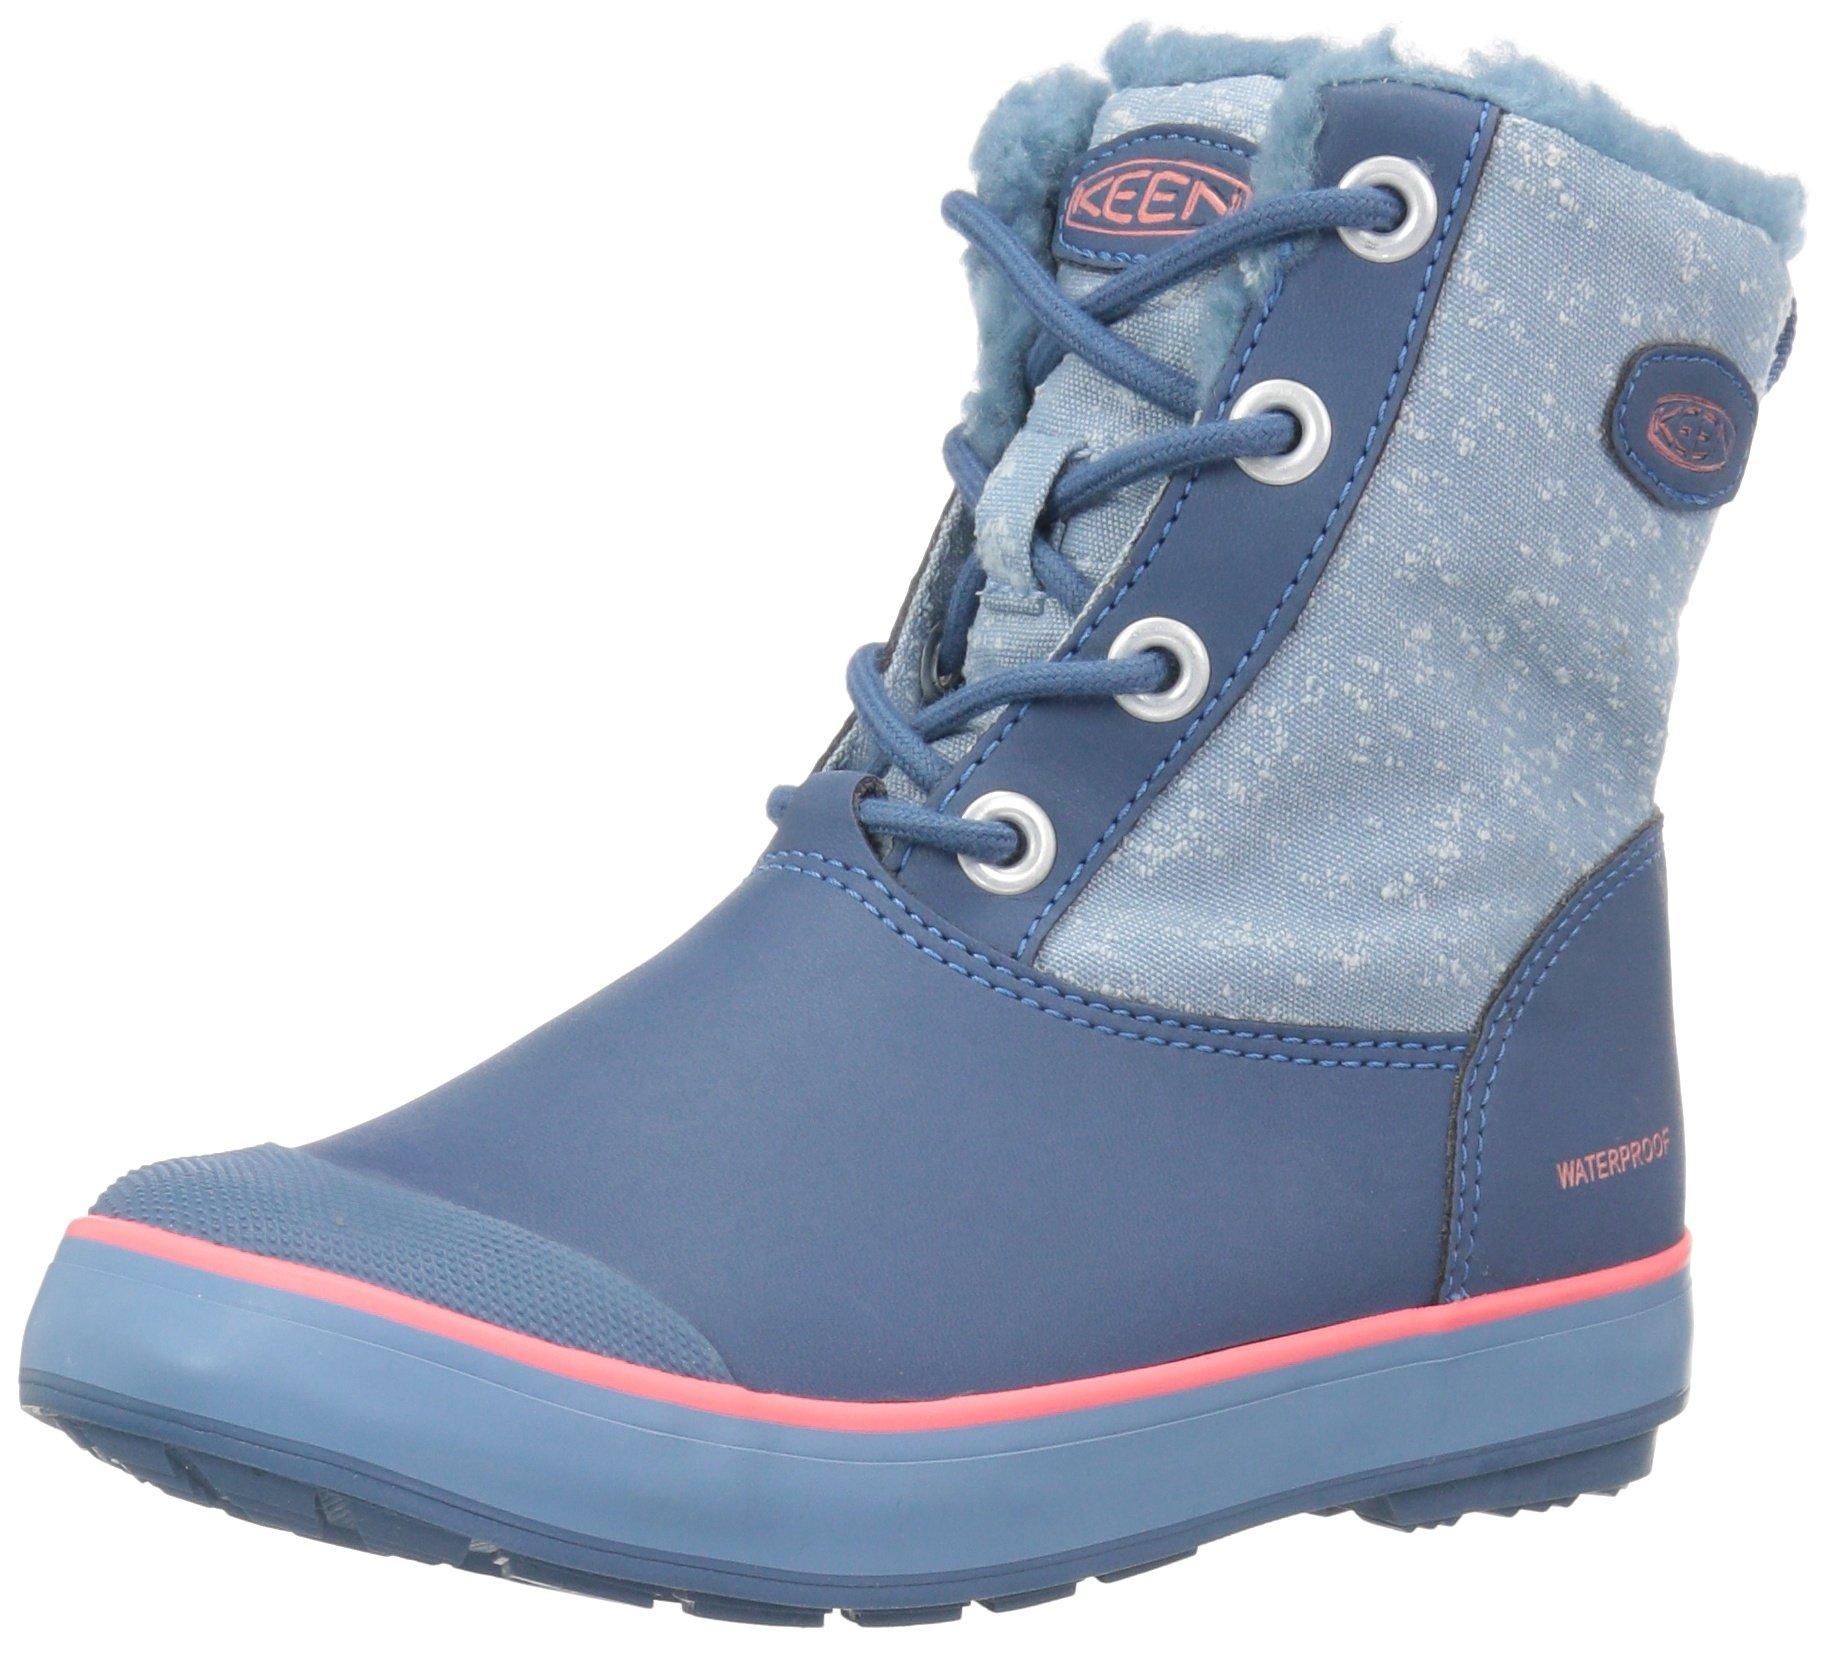 Keen Unisex ELSA WP Fashion Boot, Captains Blue/Sugar Coral, 5 Youth US Big Kid